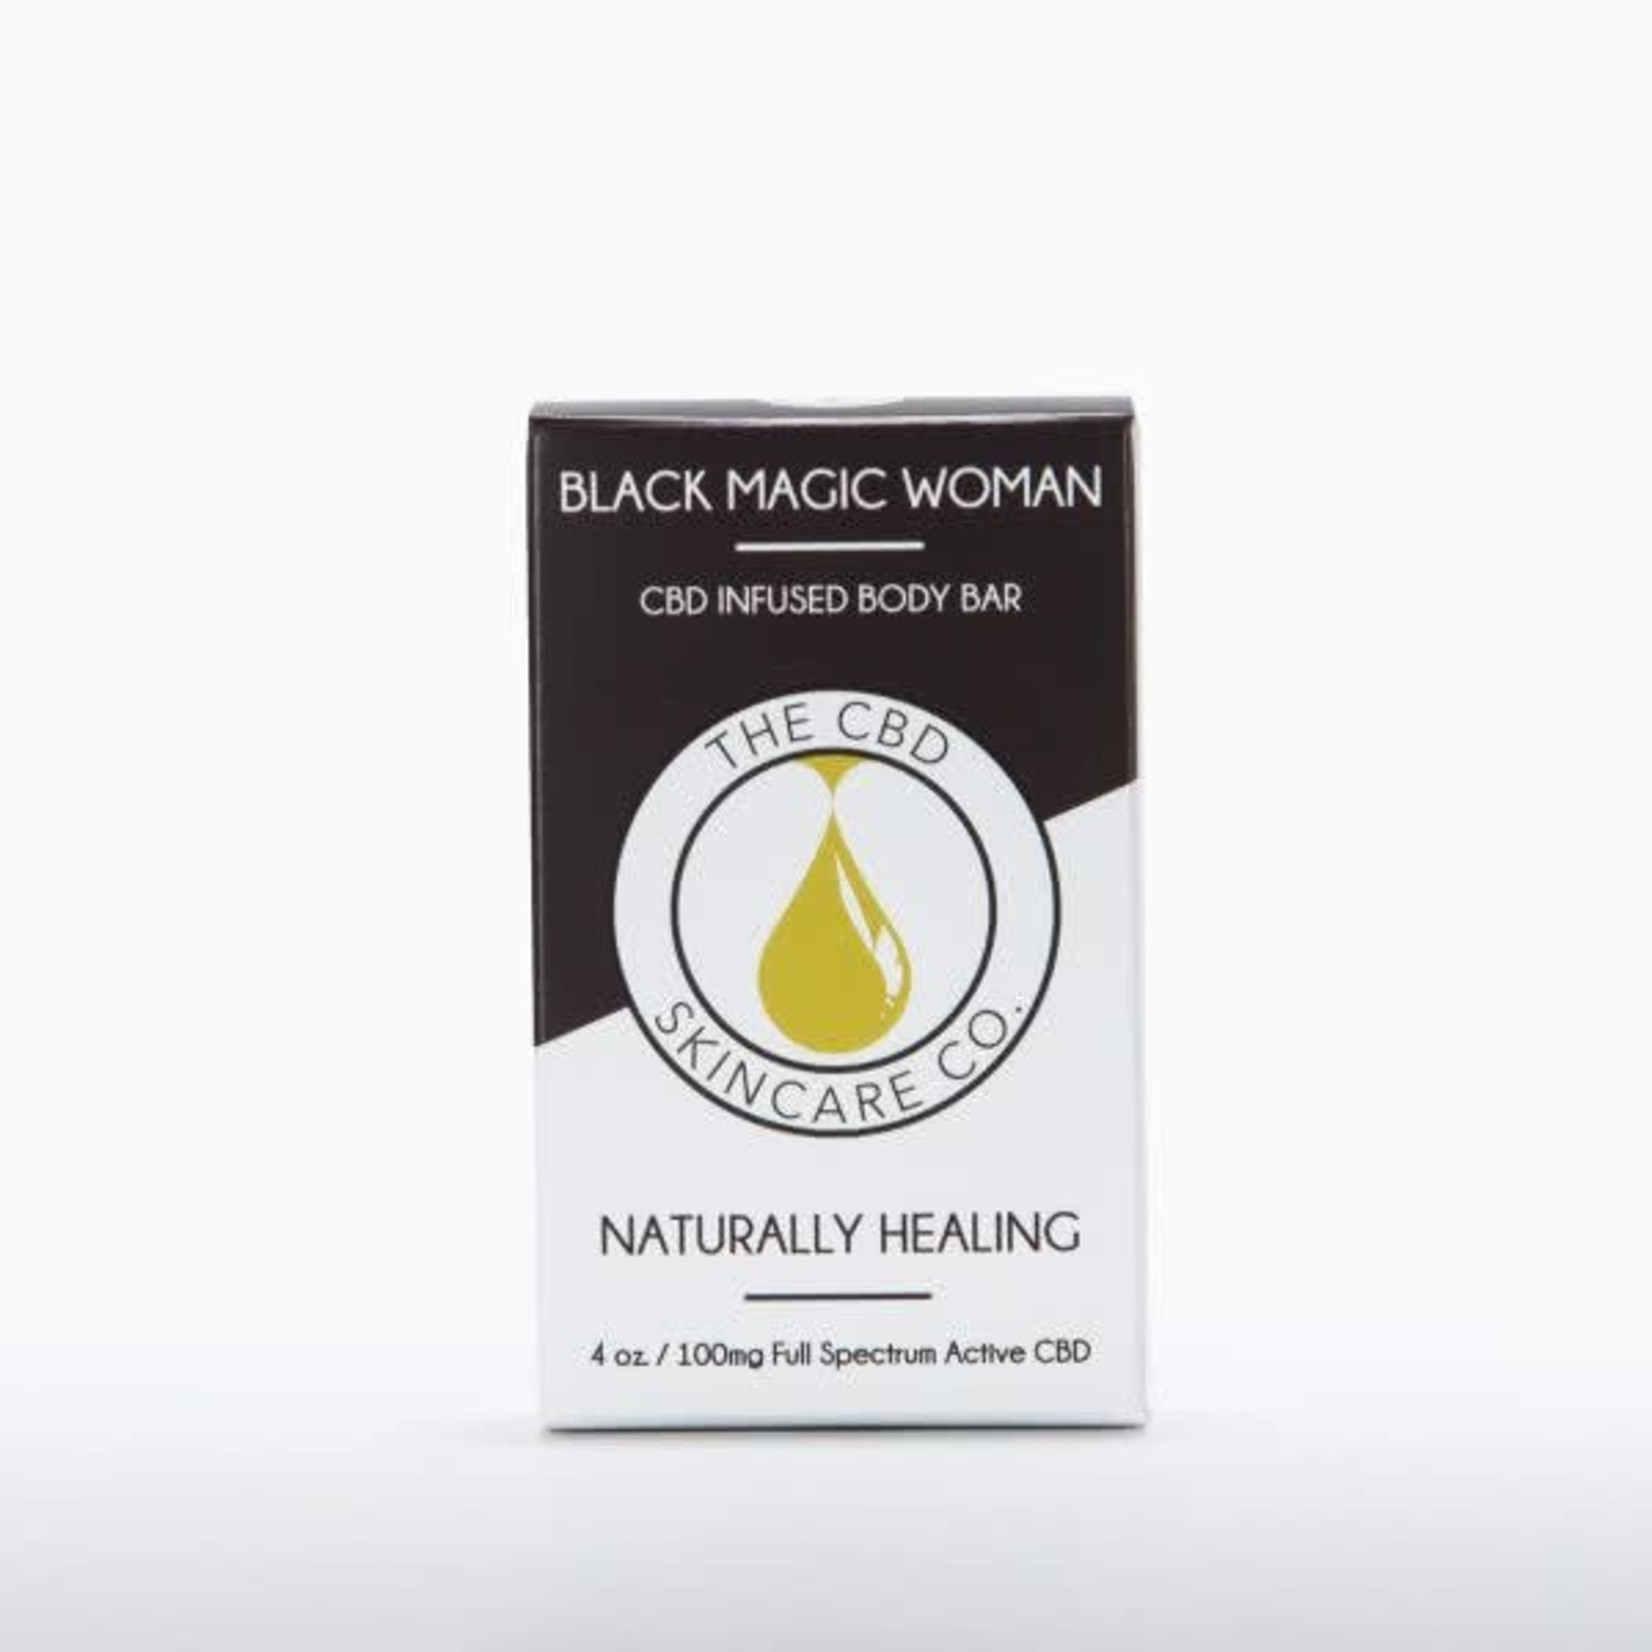 CBD Skincare Company Black Magic Woman Body Bar Soap CBD 100mg